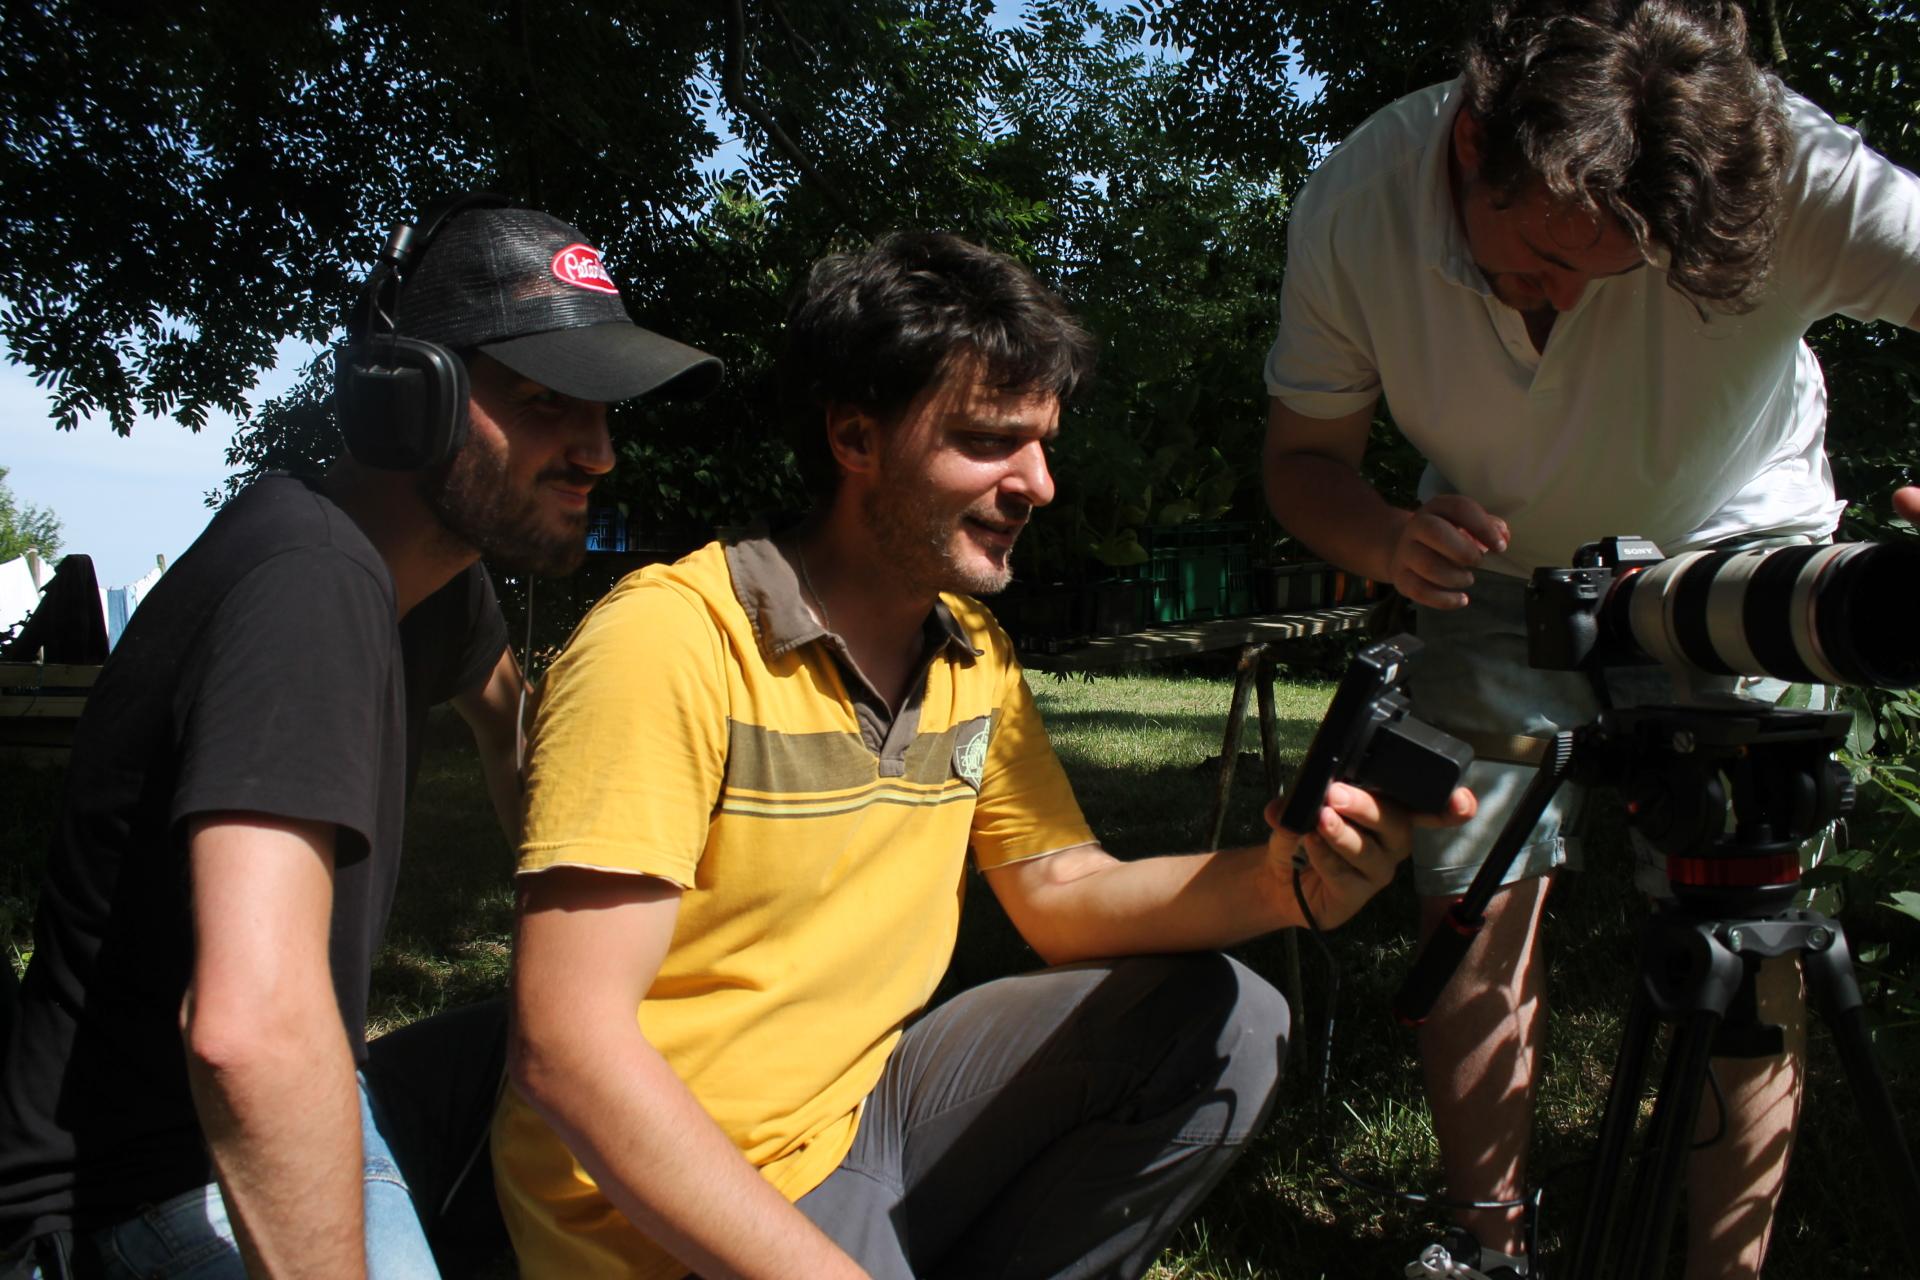 Yannig Dumoulin (center)